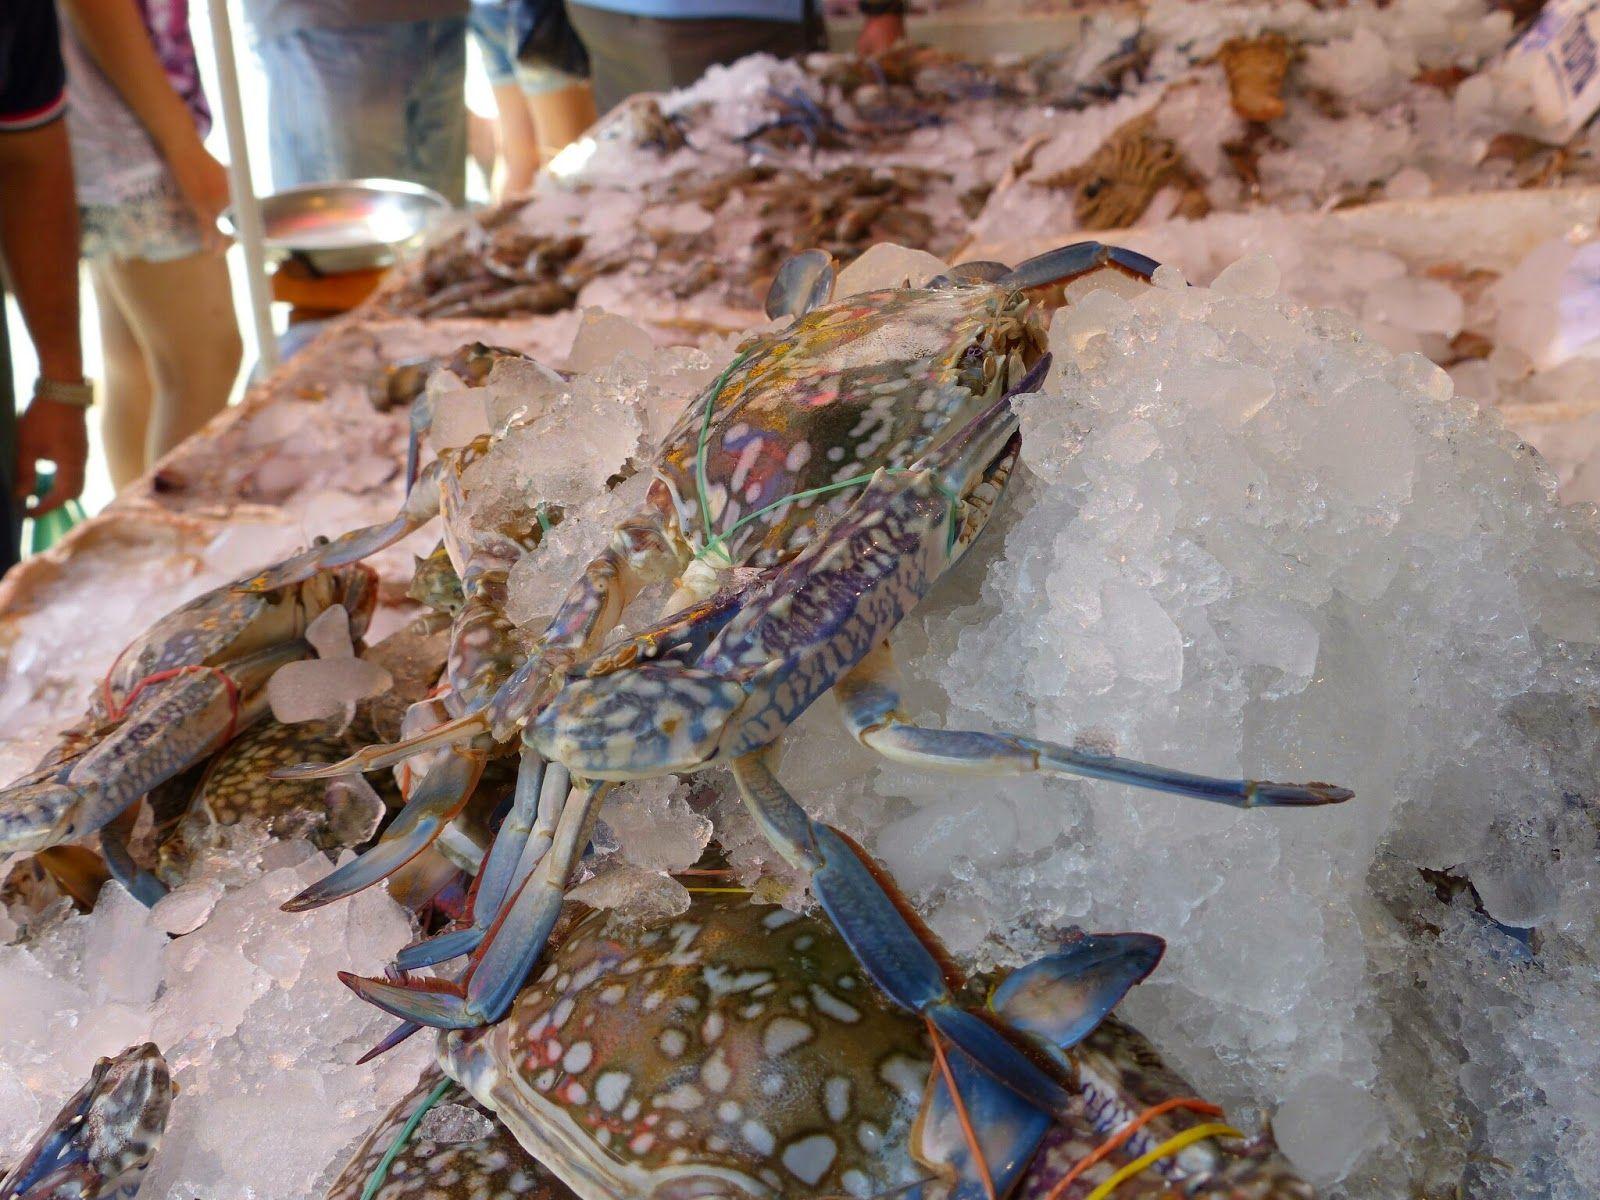 Thailand Explorer: Ban Phe Fresh Fish Market